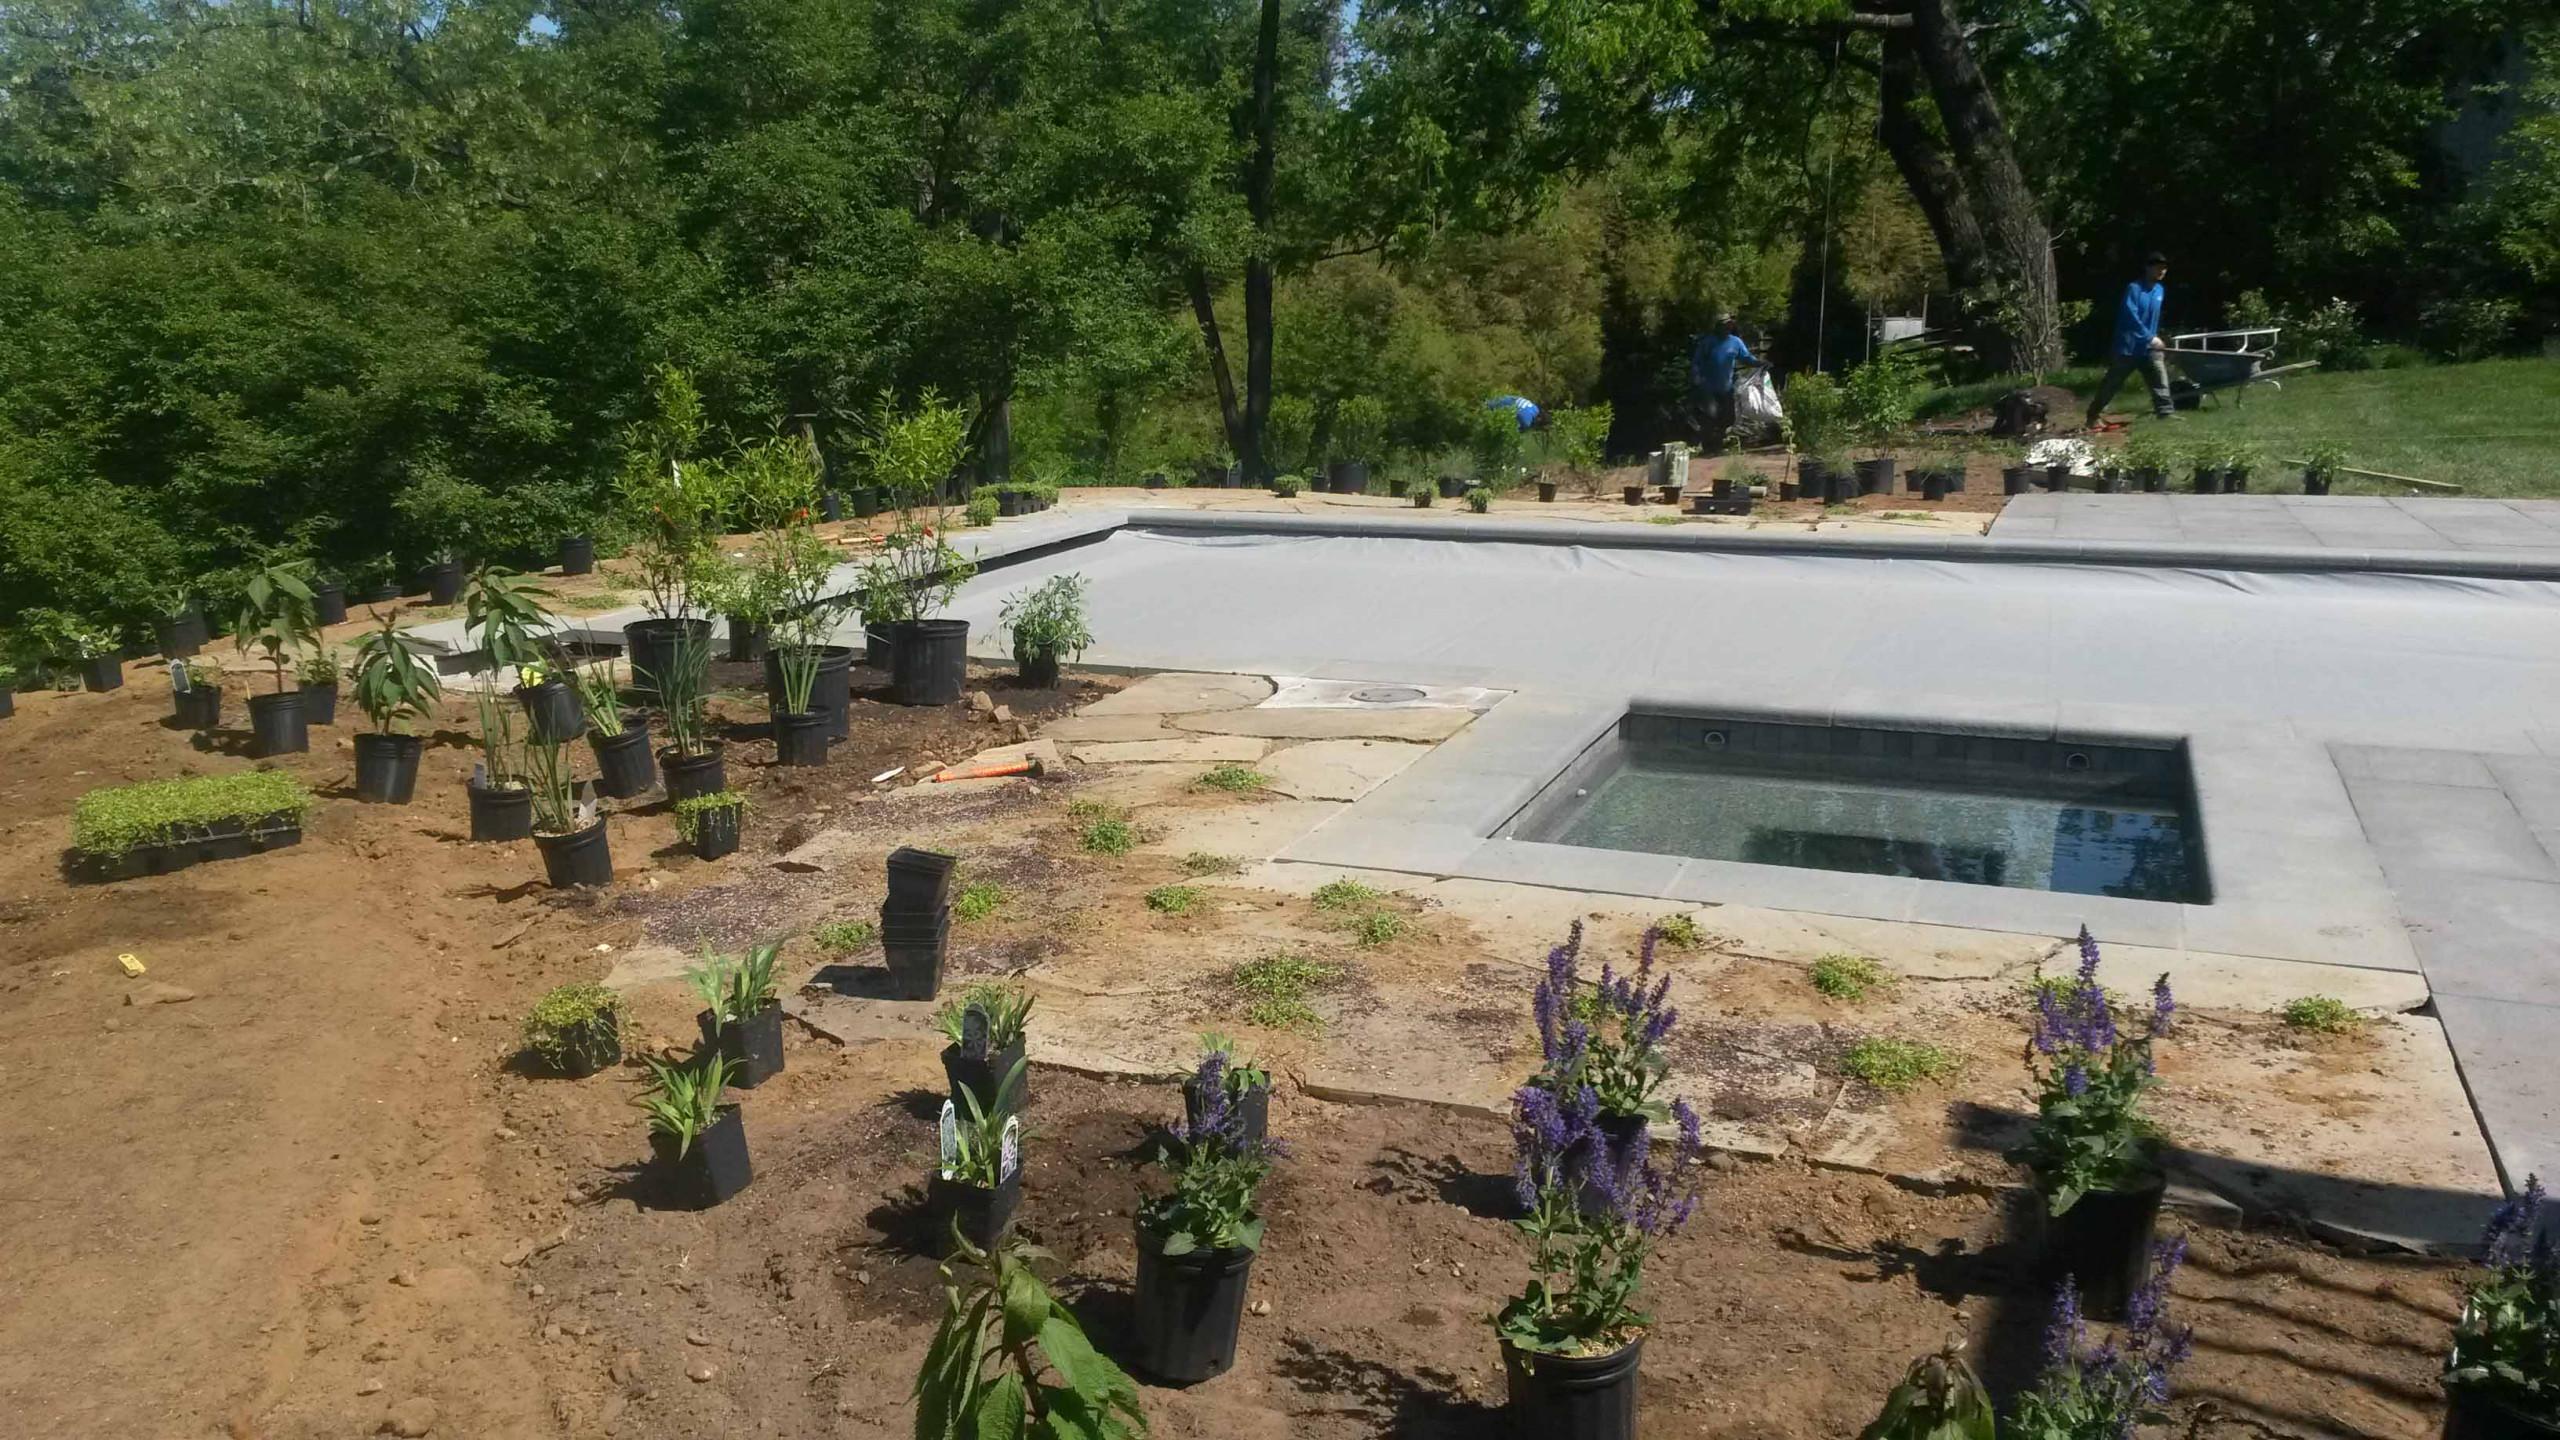 Chesapeake Bay Shore Project